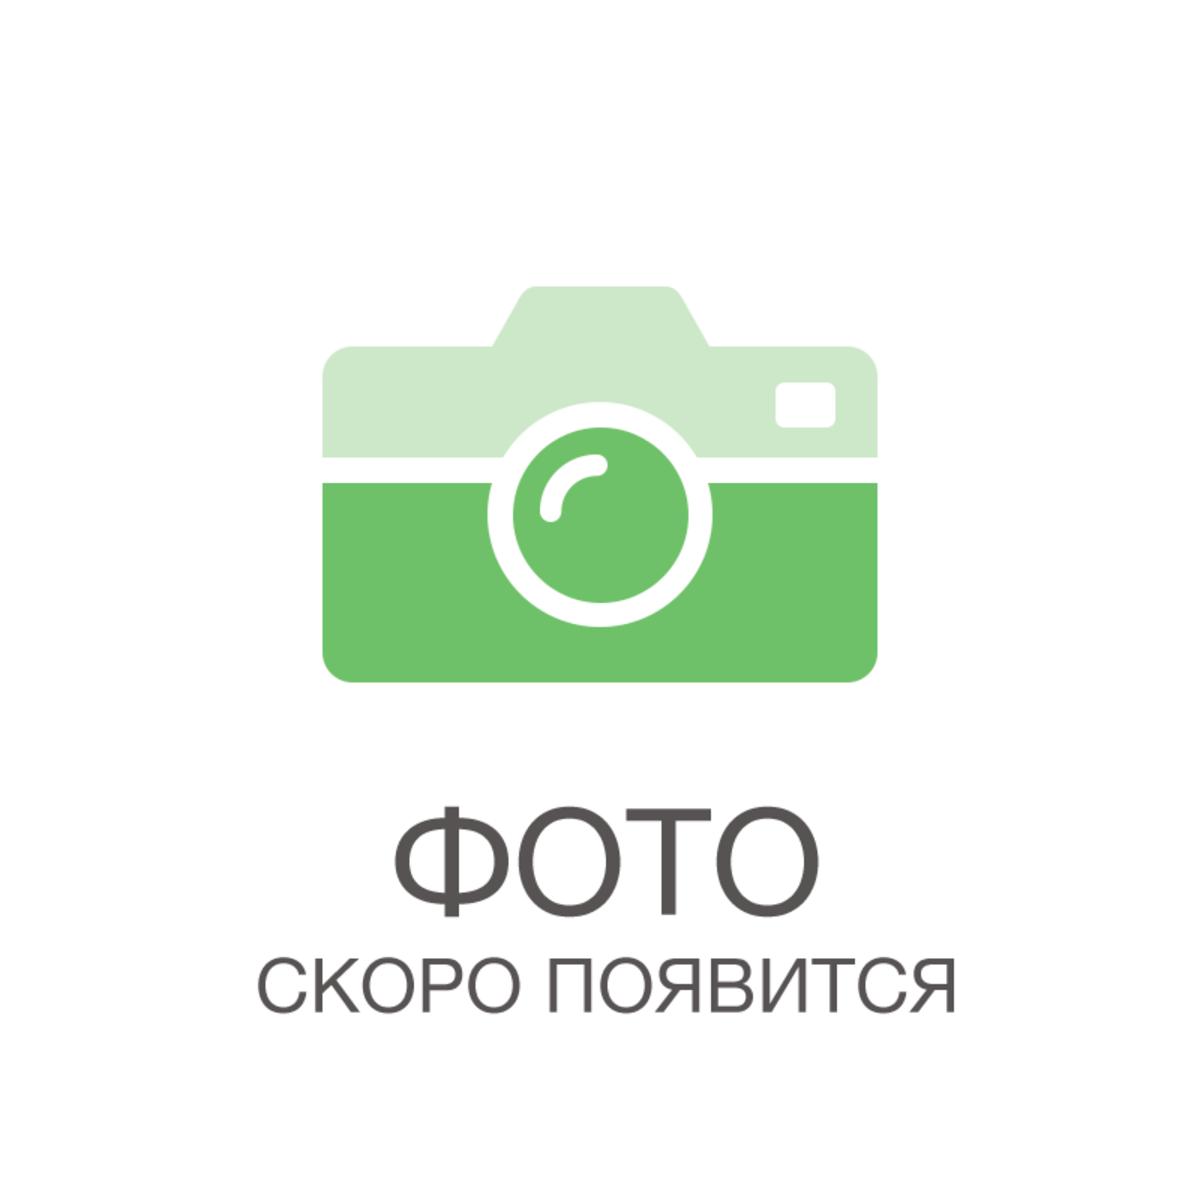 Электрогирлянда комнатная Uniel «Сеть» 1.8 м 180 LED тёплый белый IP20